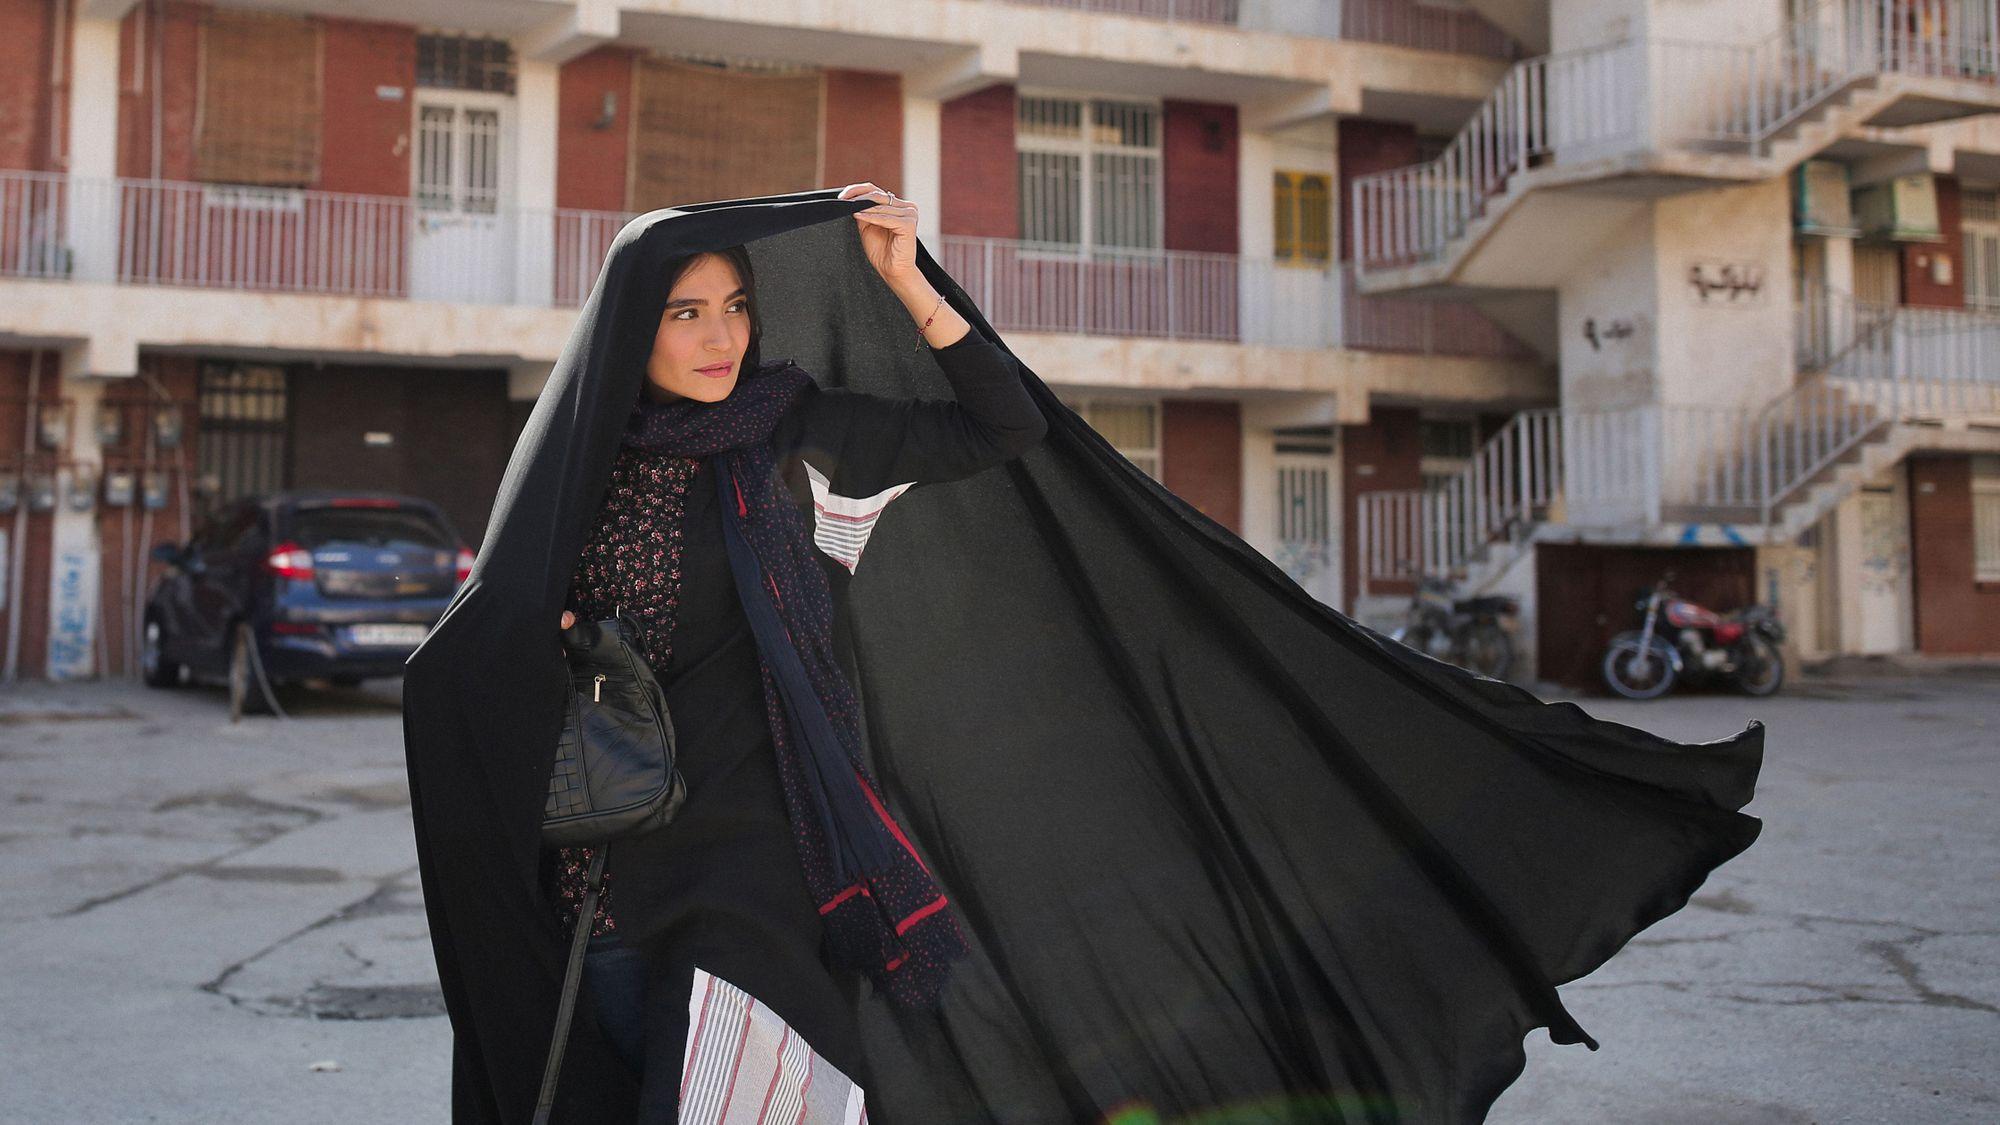 A Hero recensione film di Asghar Farhadi con Amir Jadidi